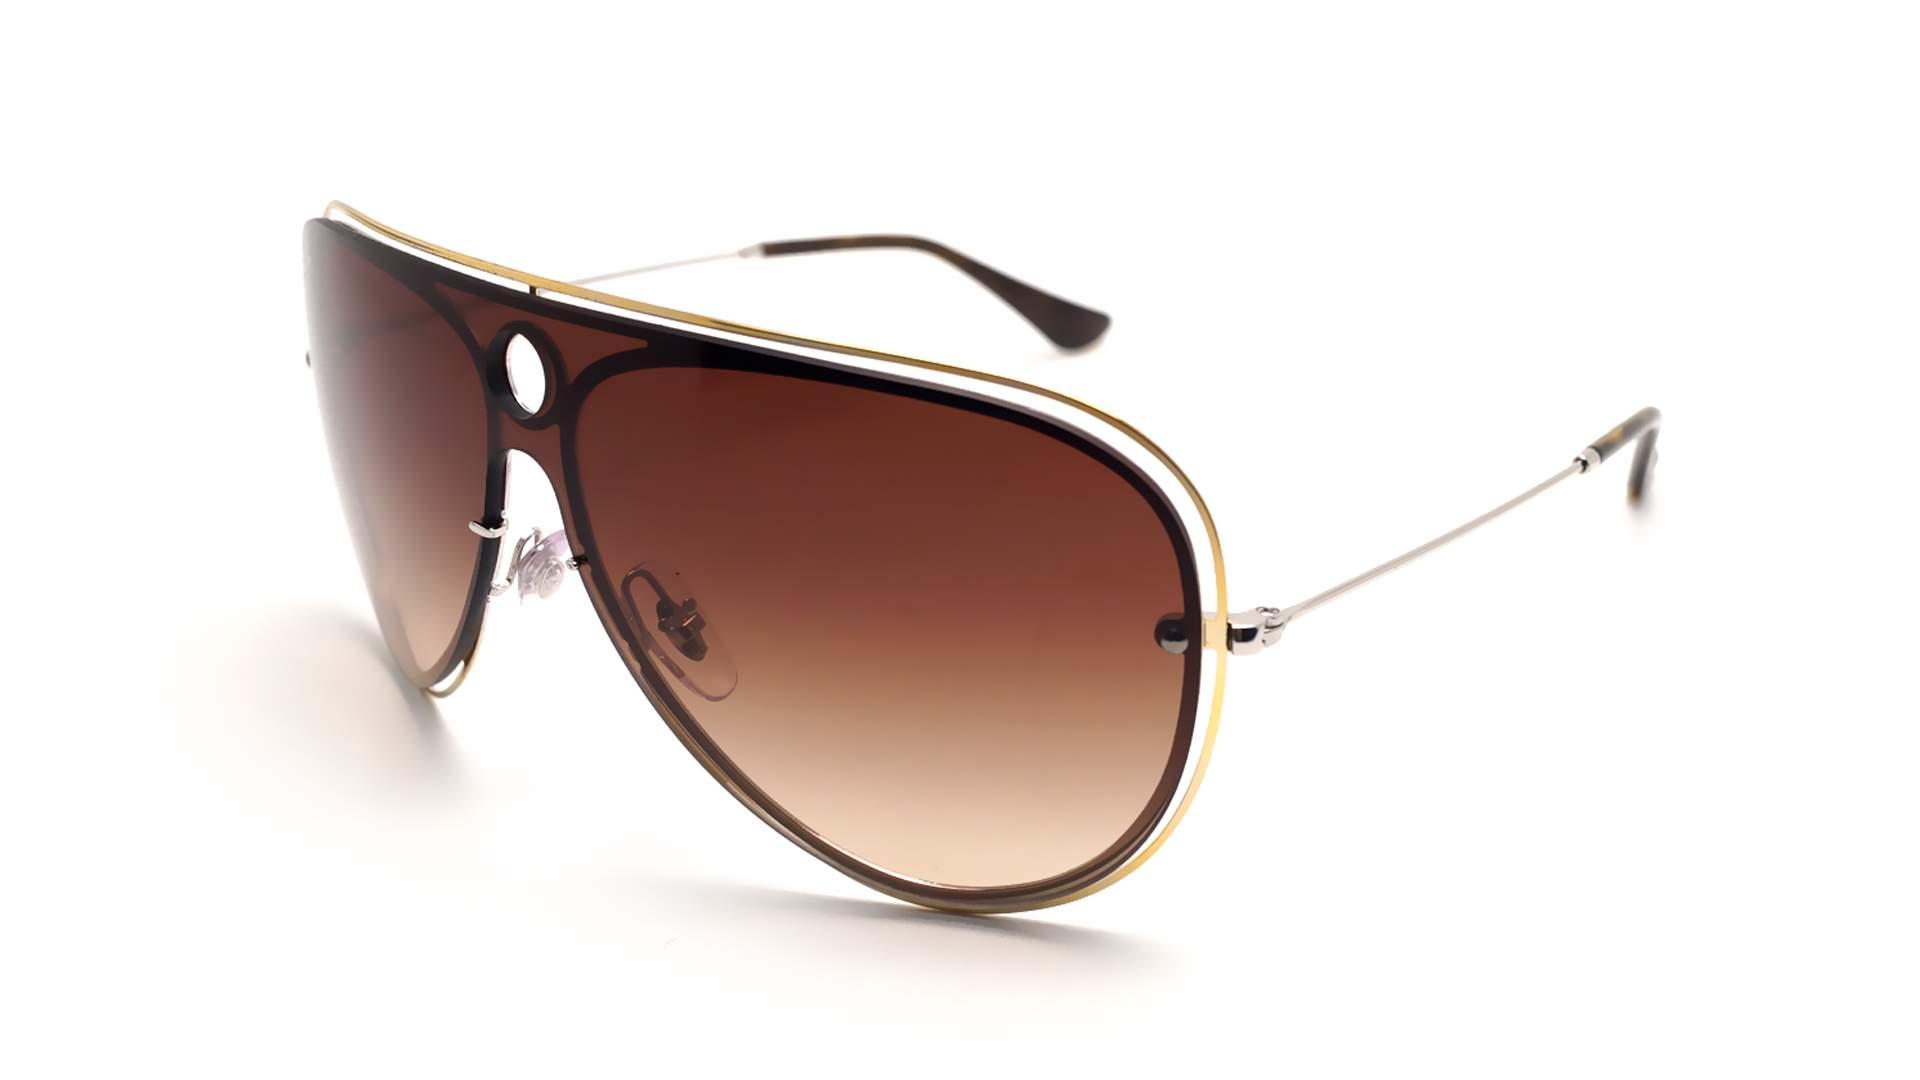 e13f0ac983 Sunglasses Ray-Ban Shooter Blaze Gold RB3605N 9096 13 32-20 Medium Gradient